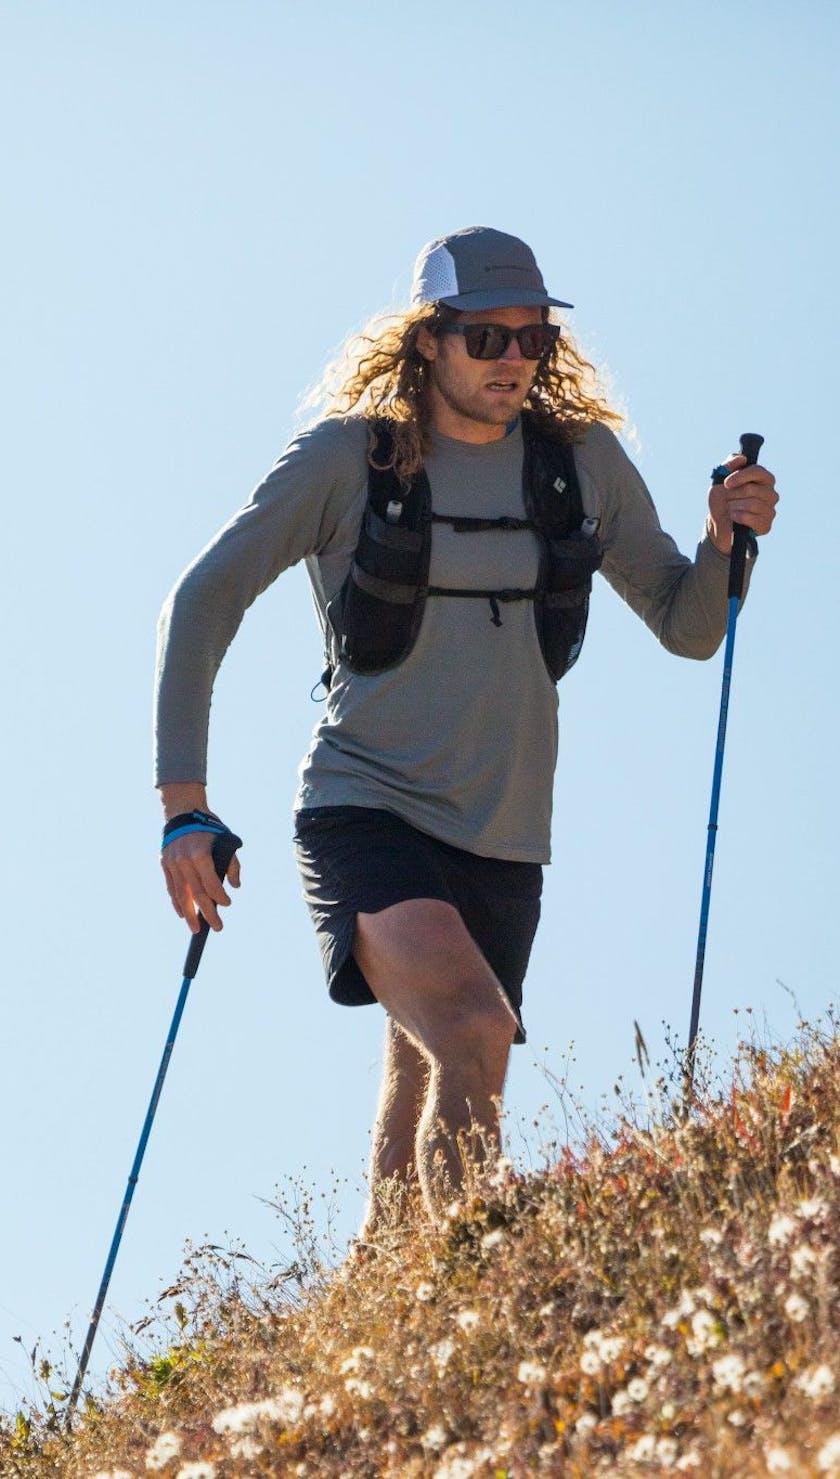 Joe Grant trail running using the Distance Carbon FLZ poles